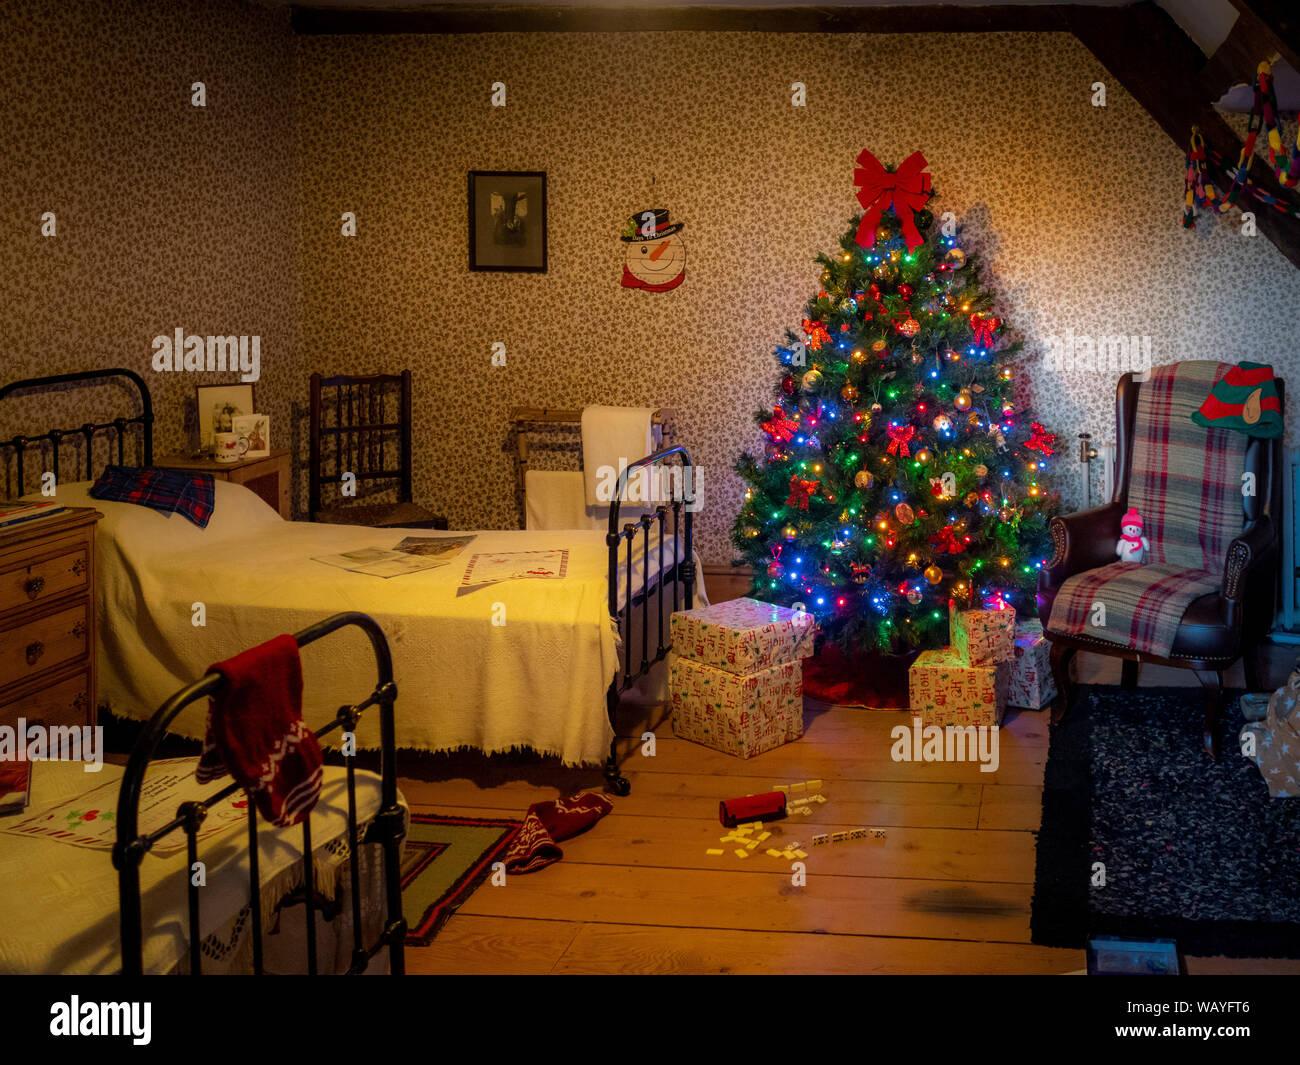 Traditional childrens room at Christmas, Nunnington Hall, North Yorkshire, UK. Stock Photo